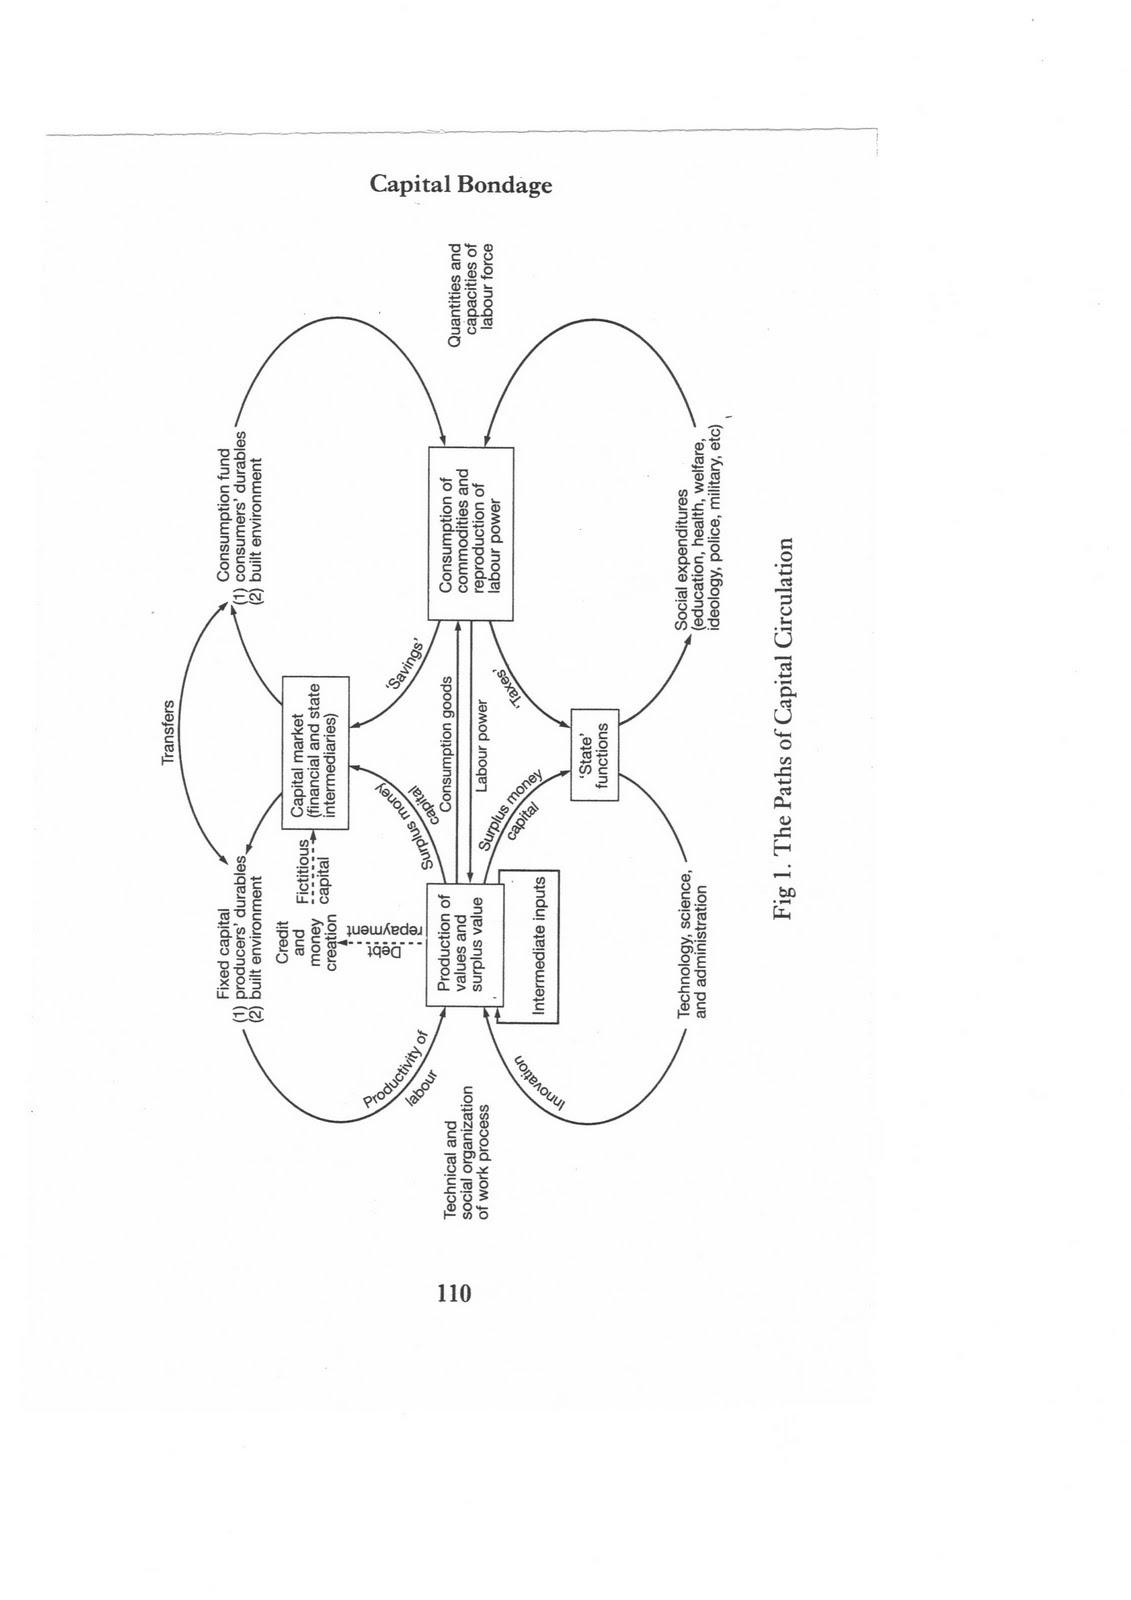 wiring diagram for viking hot tub viking hot tub parts